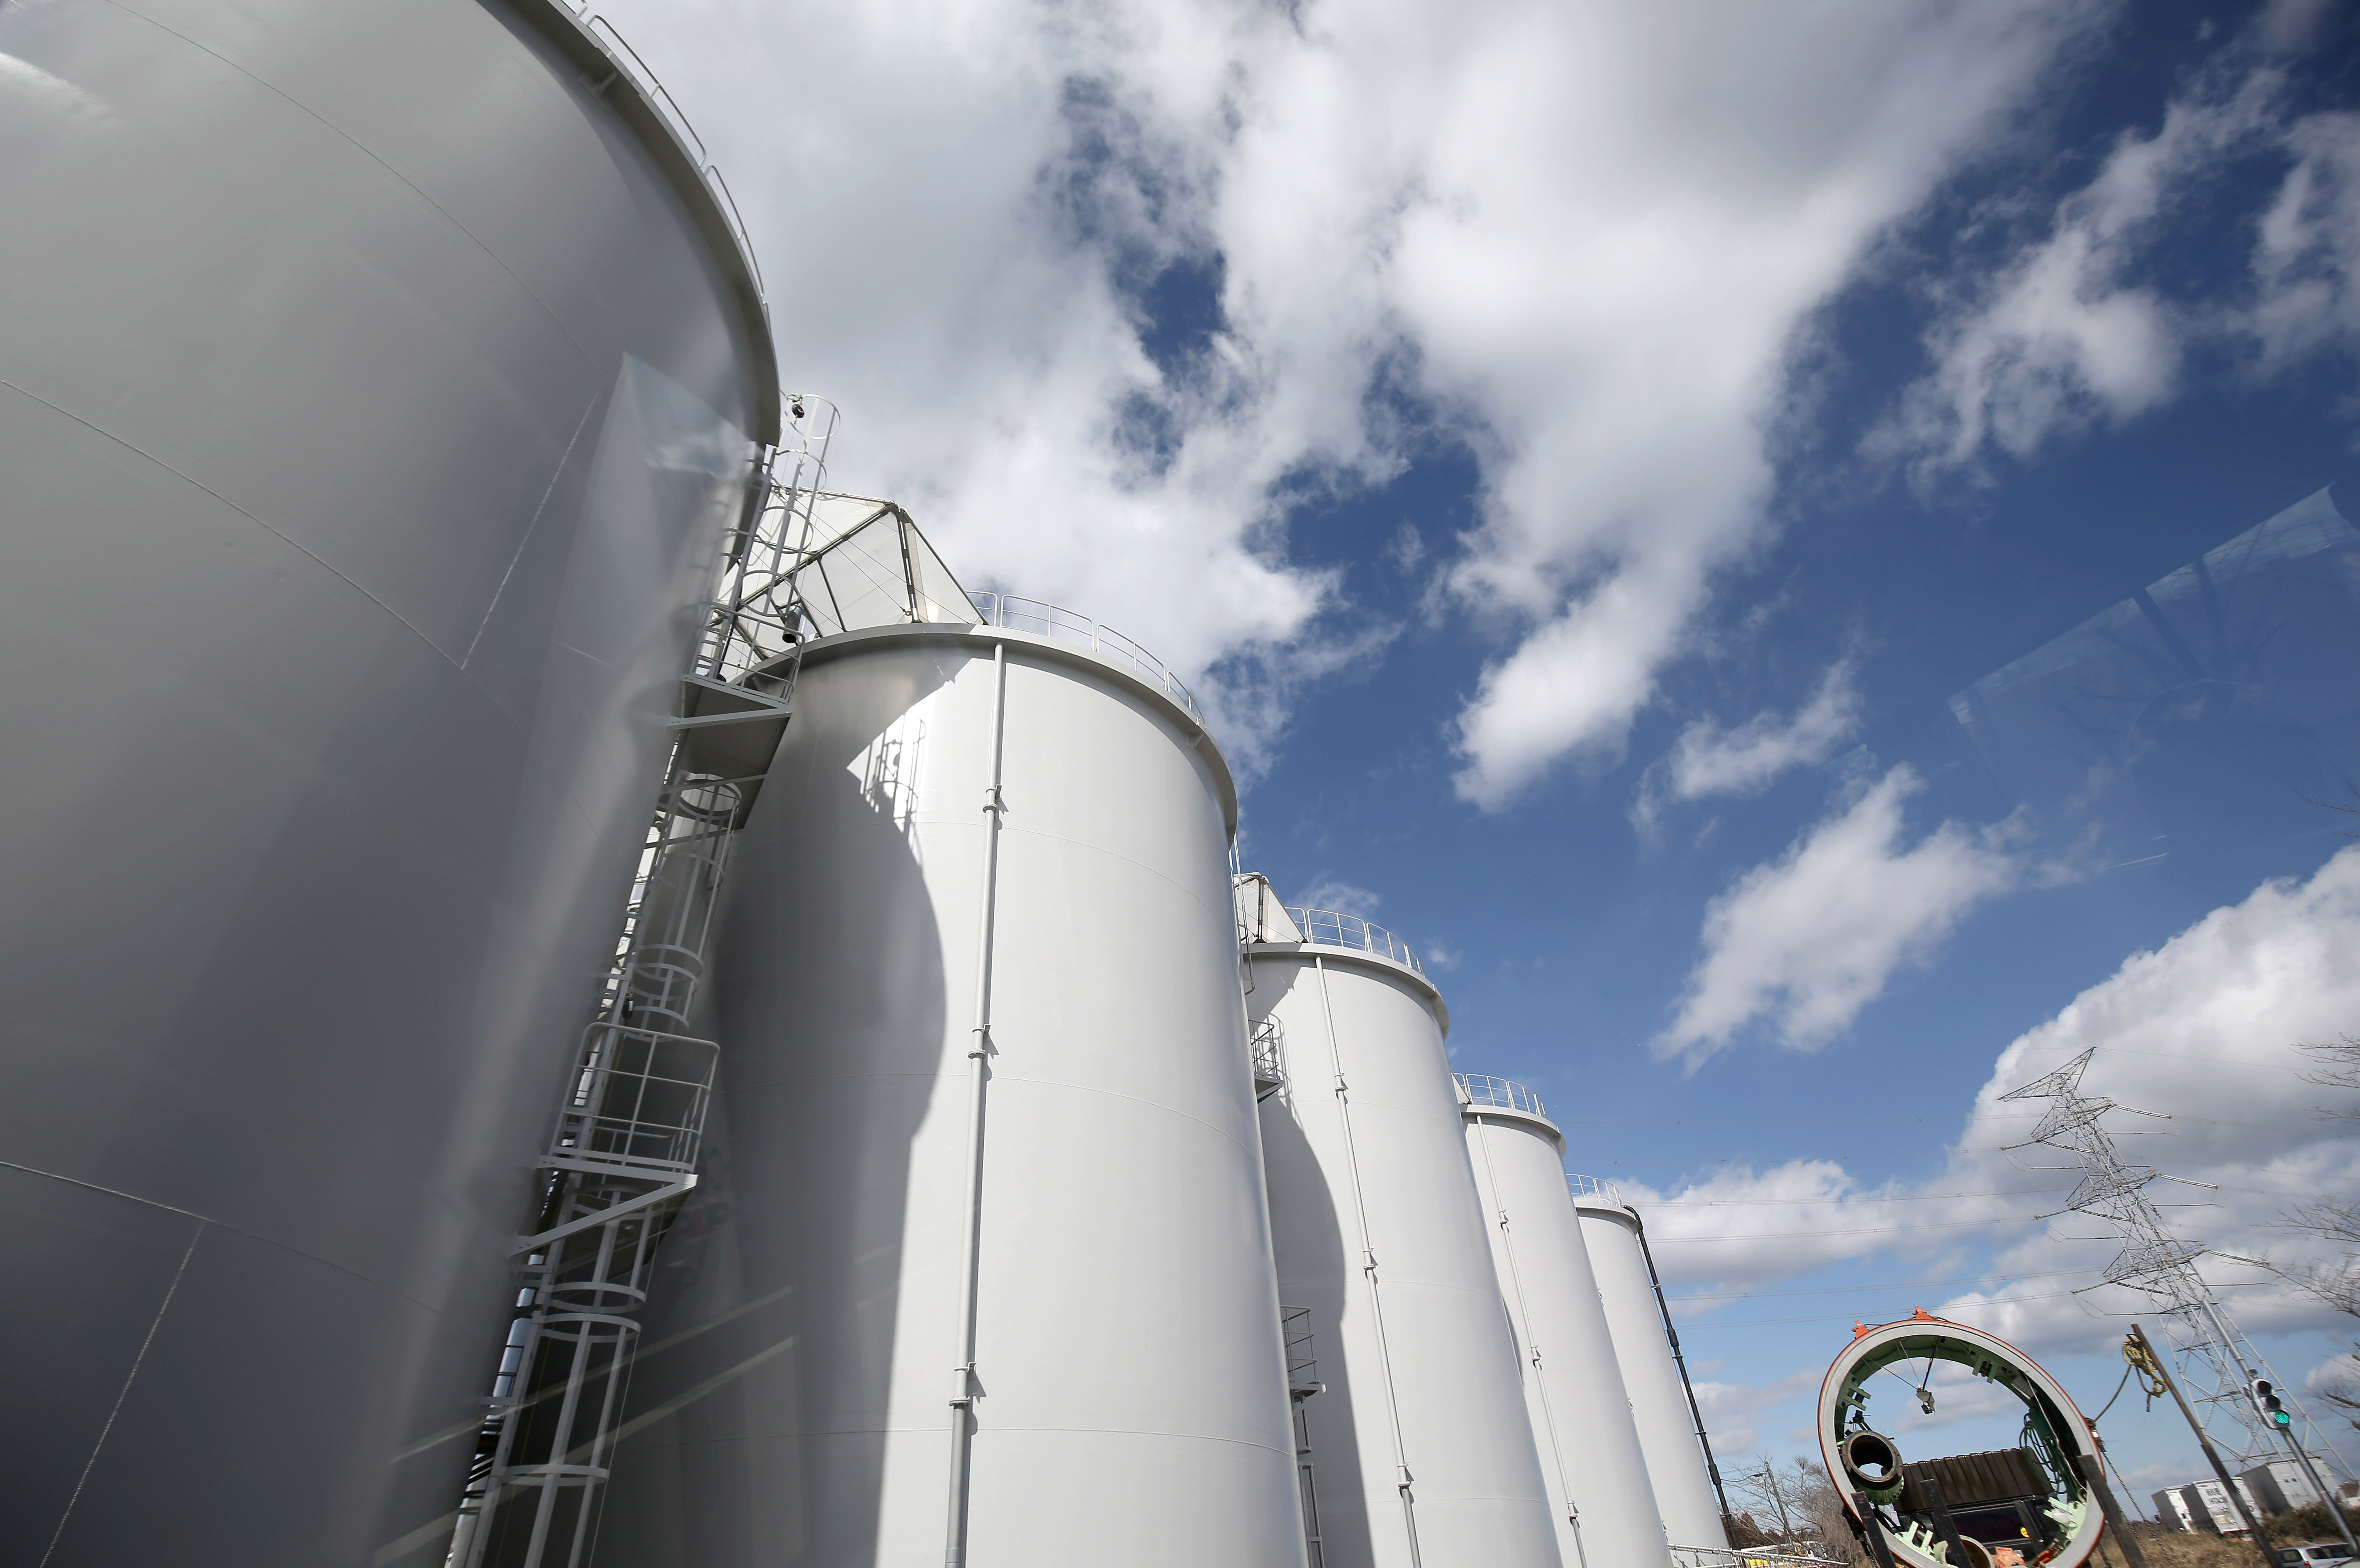 China i-a cerut vicepremierului japonez sa bea apa de la Fukushima, dupa ce acesta a spus ca este curata si va fi aruncata in mare